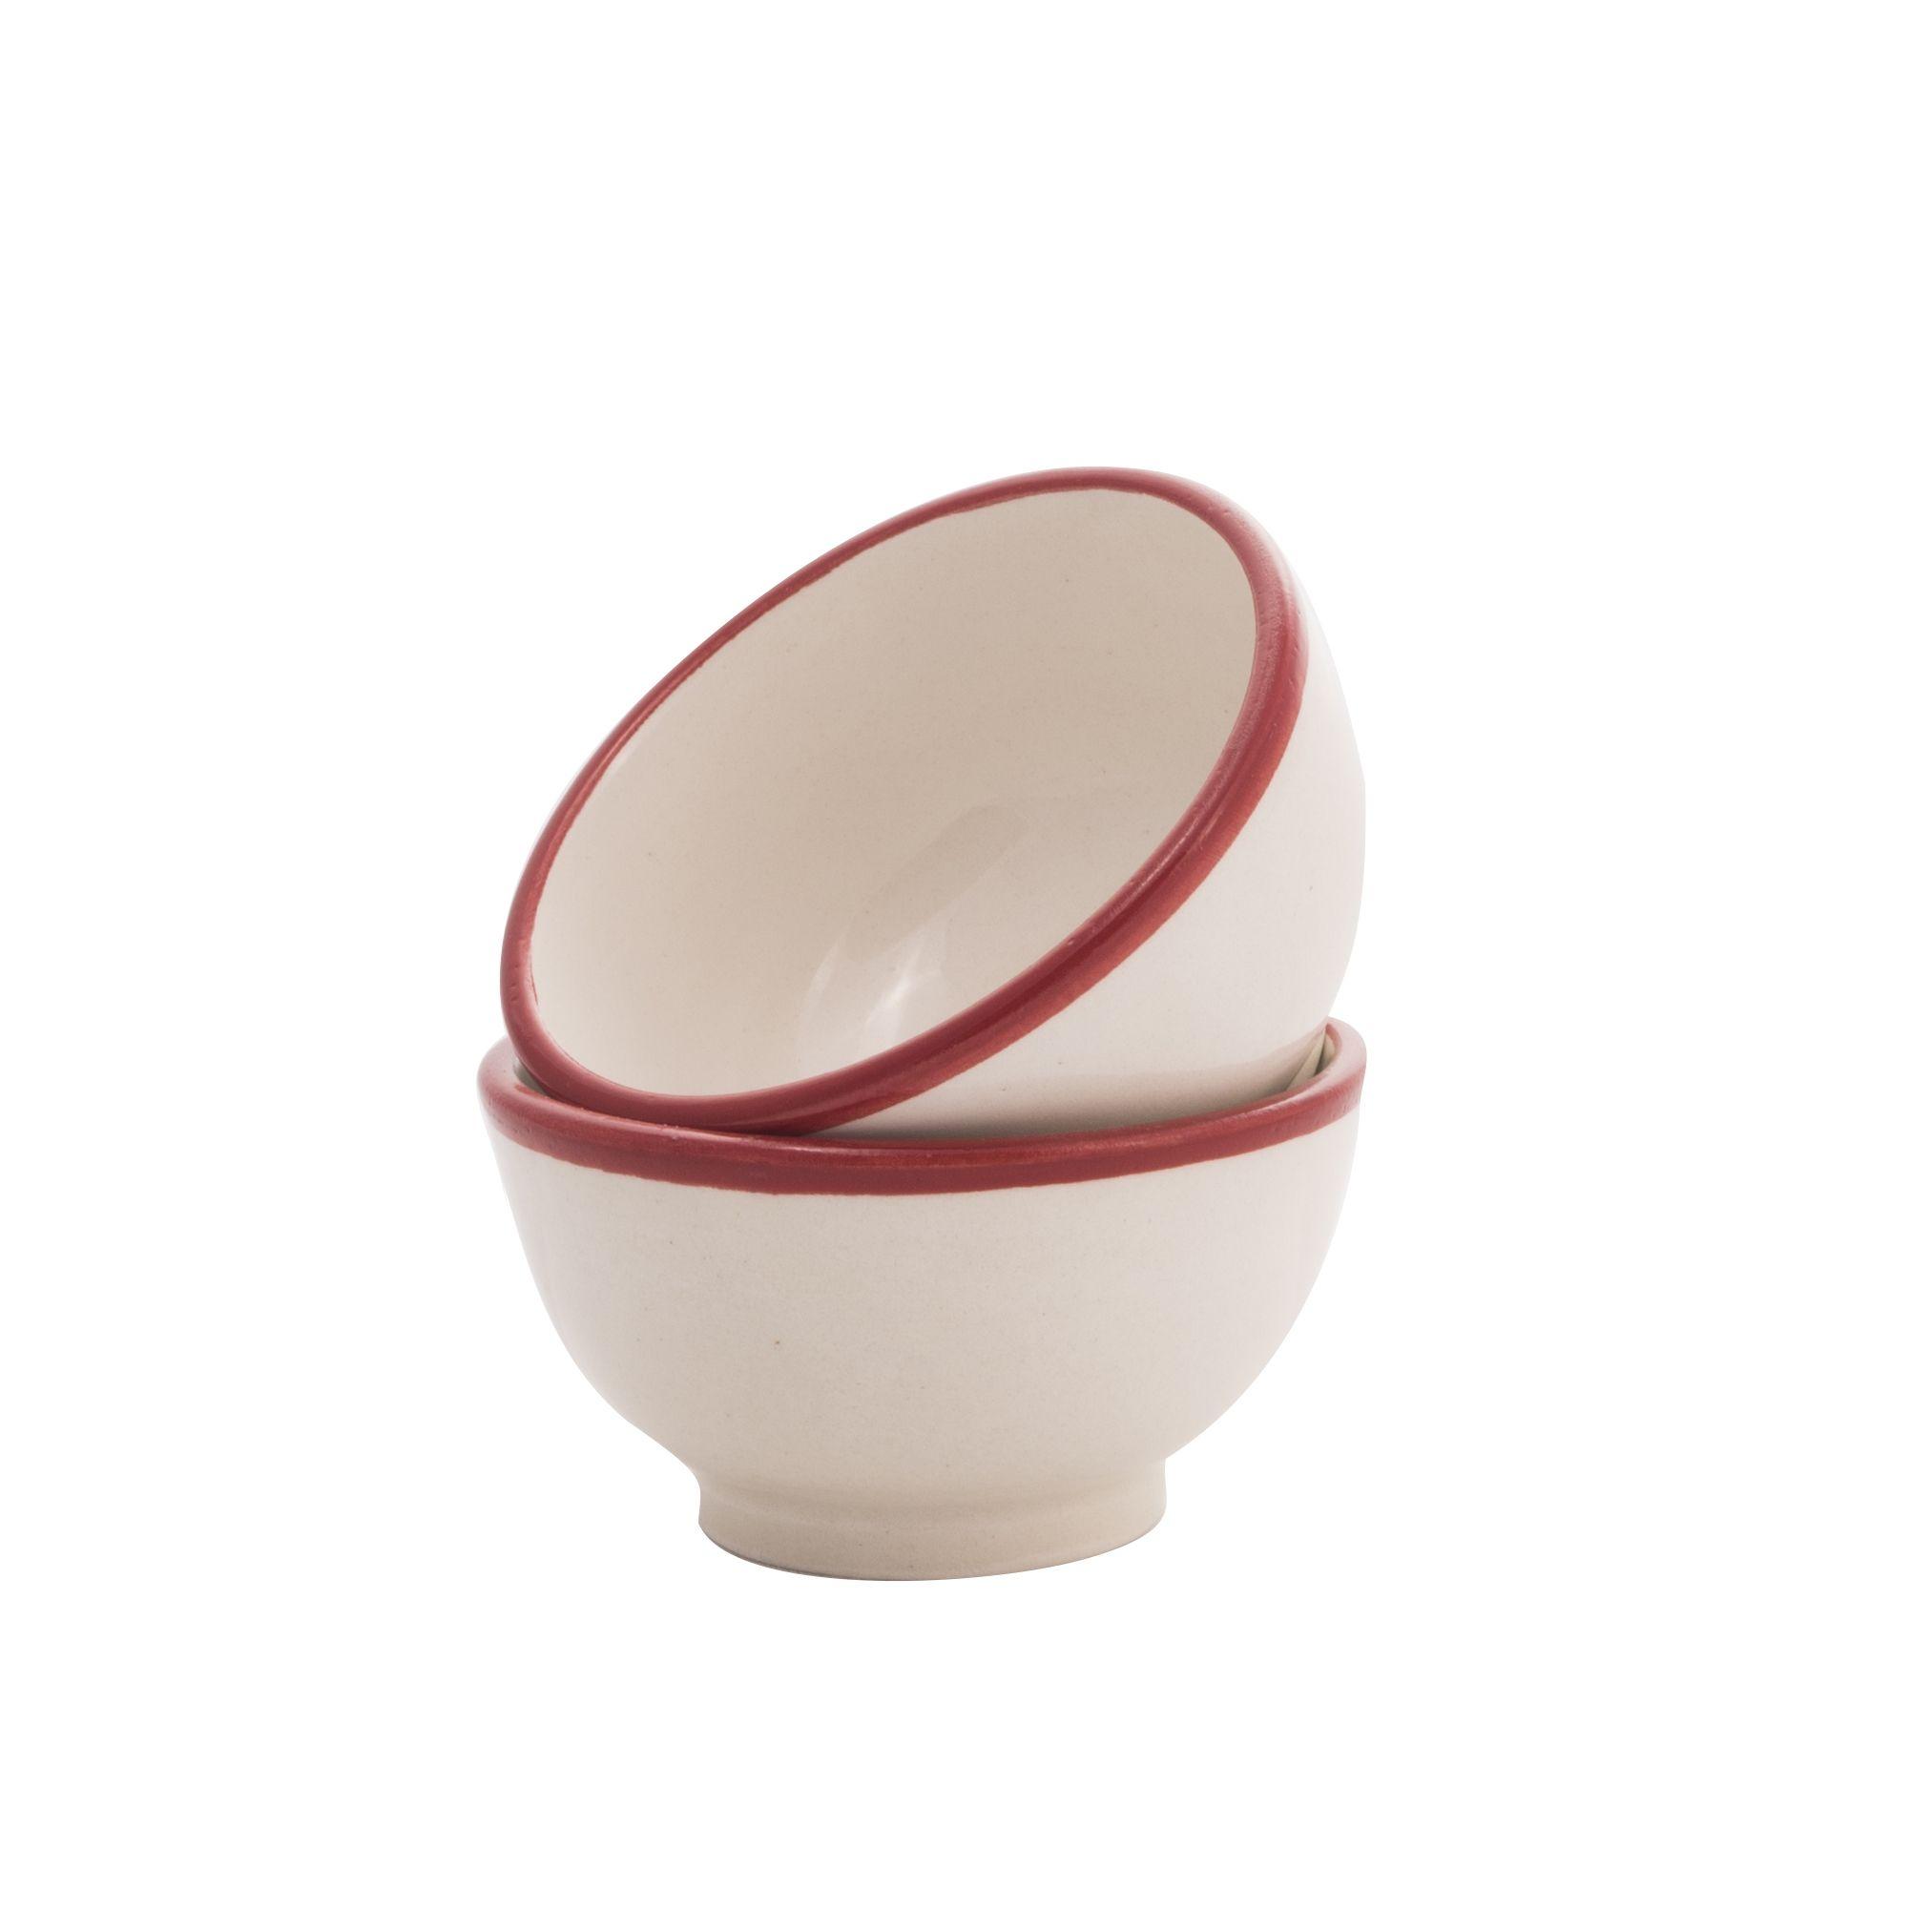 Naim - Bowl cerámico para preparar mascarillas, de Potions BCN